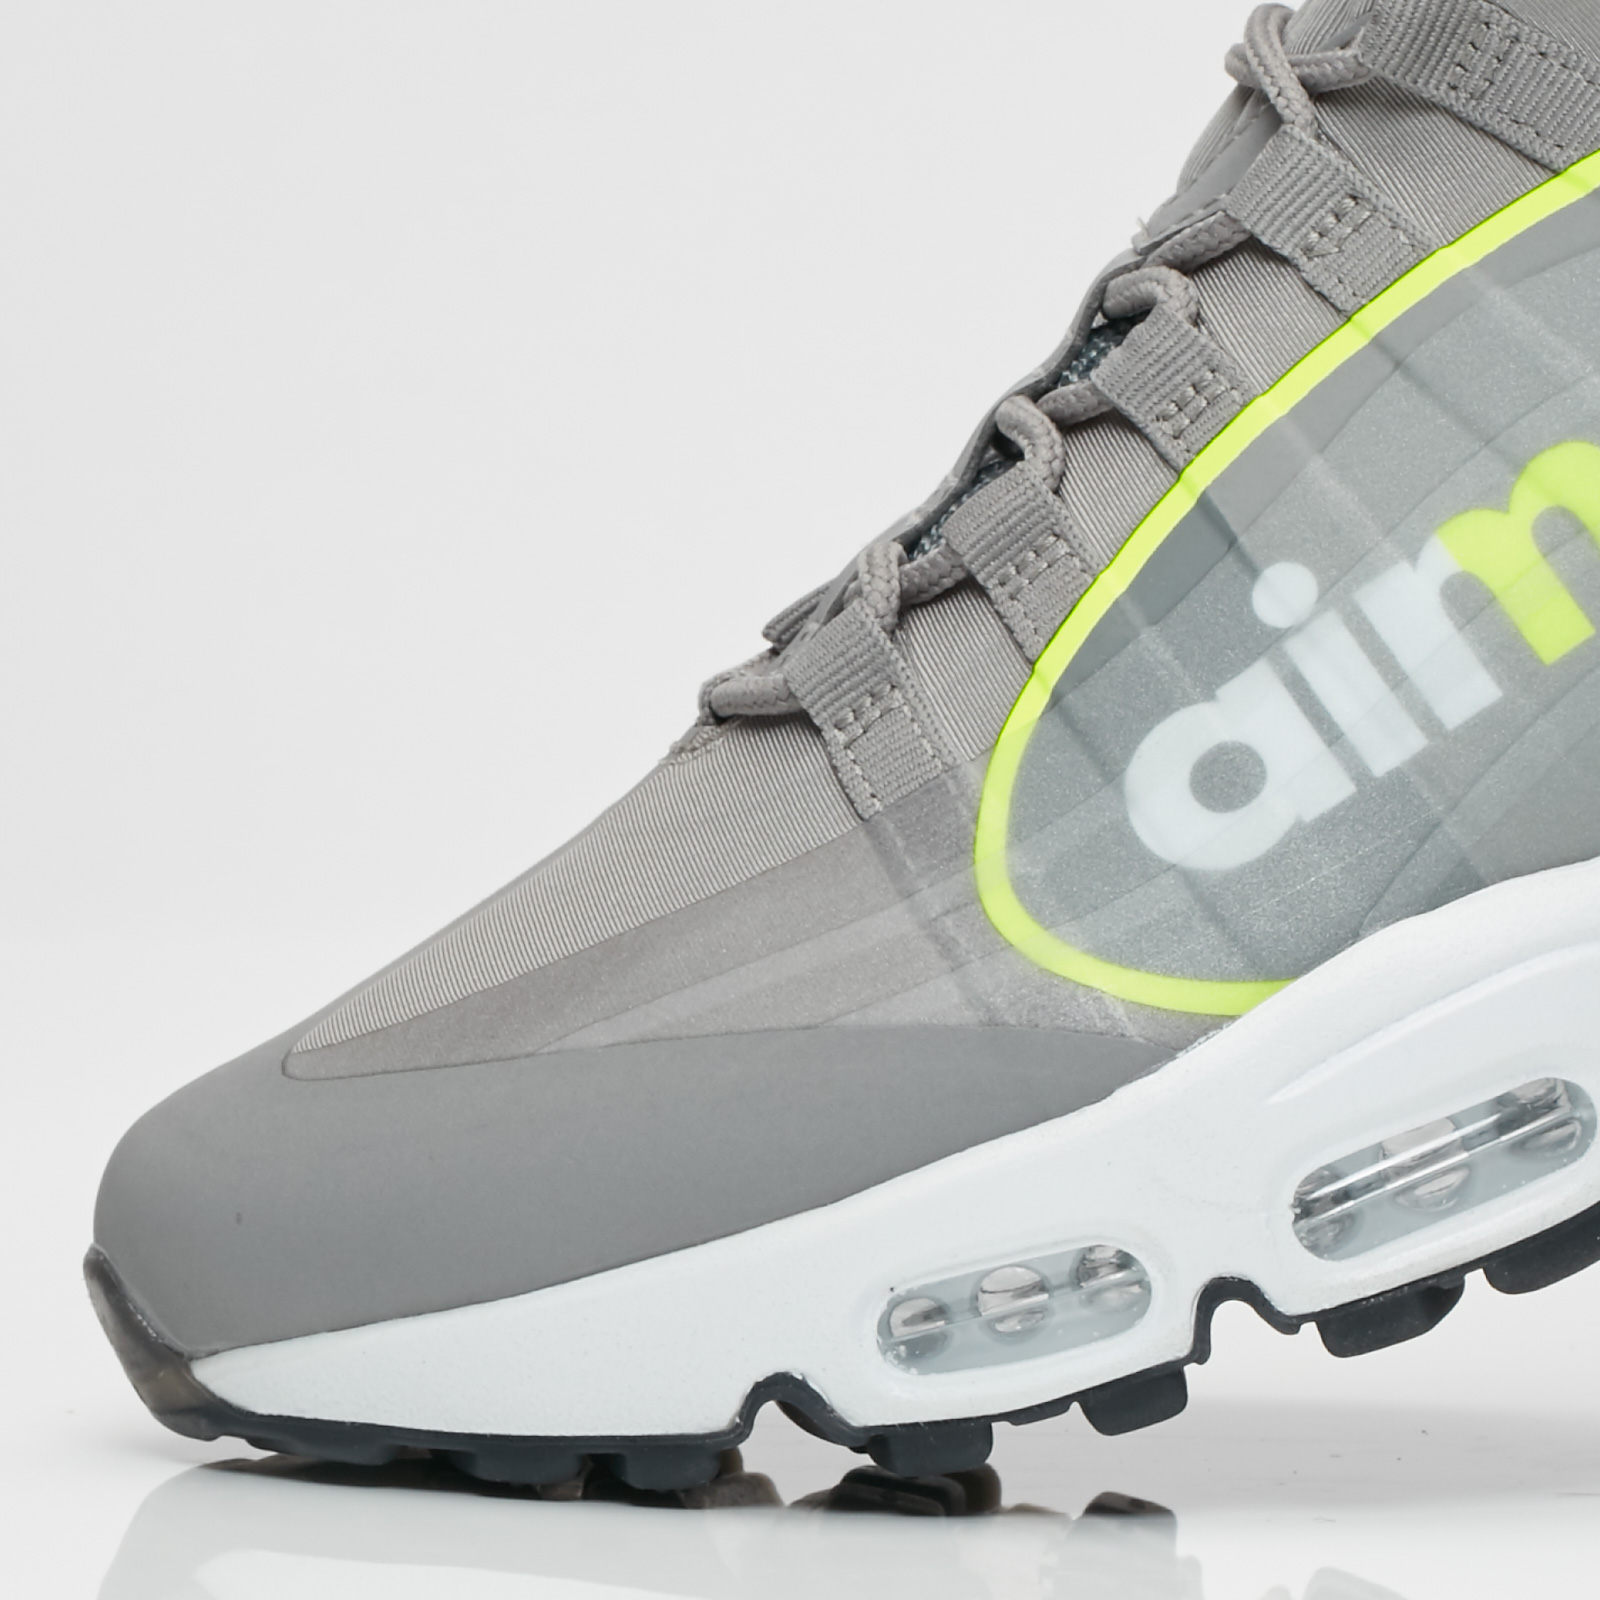 3ef62b69916 Nike Air Max 95 NS GPX - Aj7183-001 - Sneakersnstuff